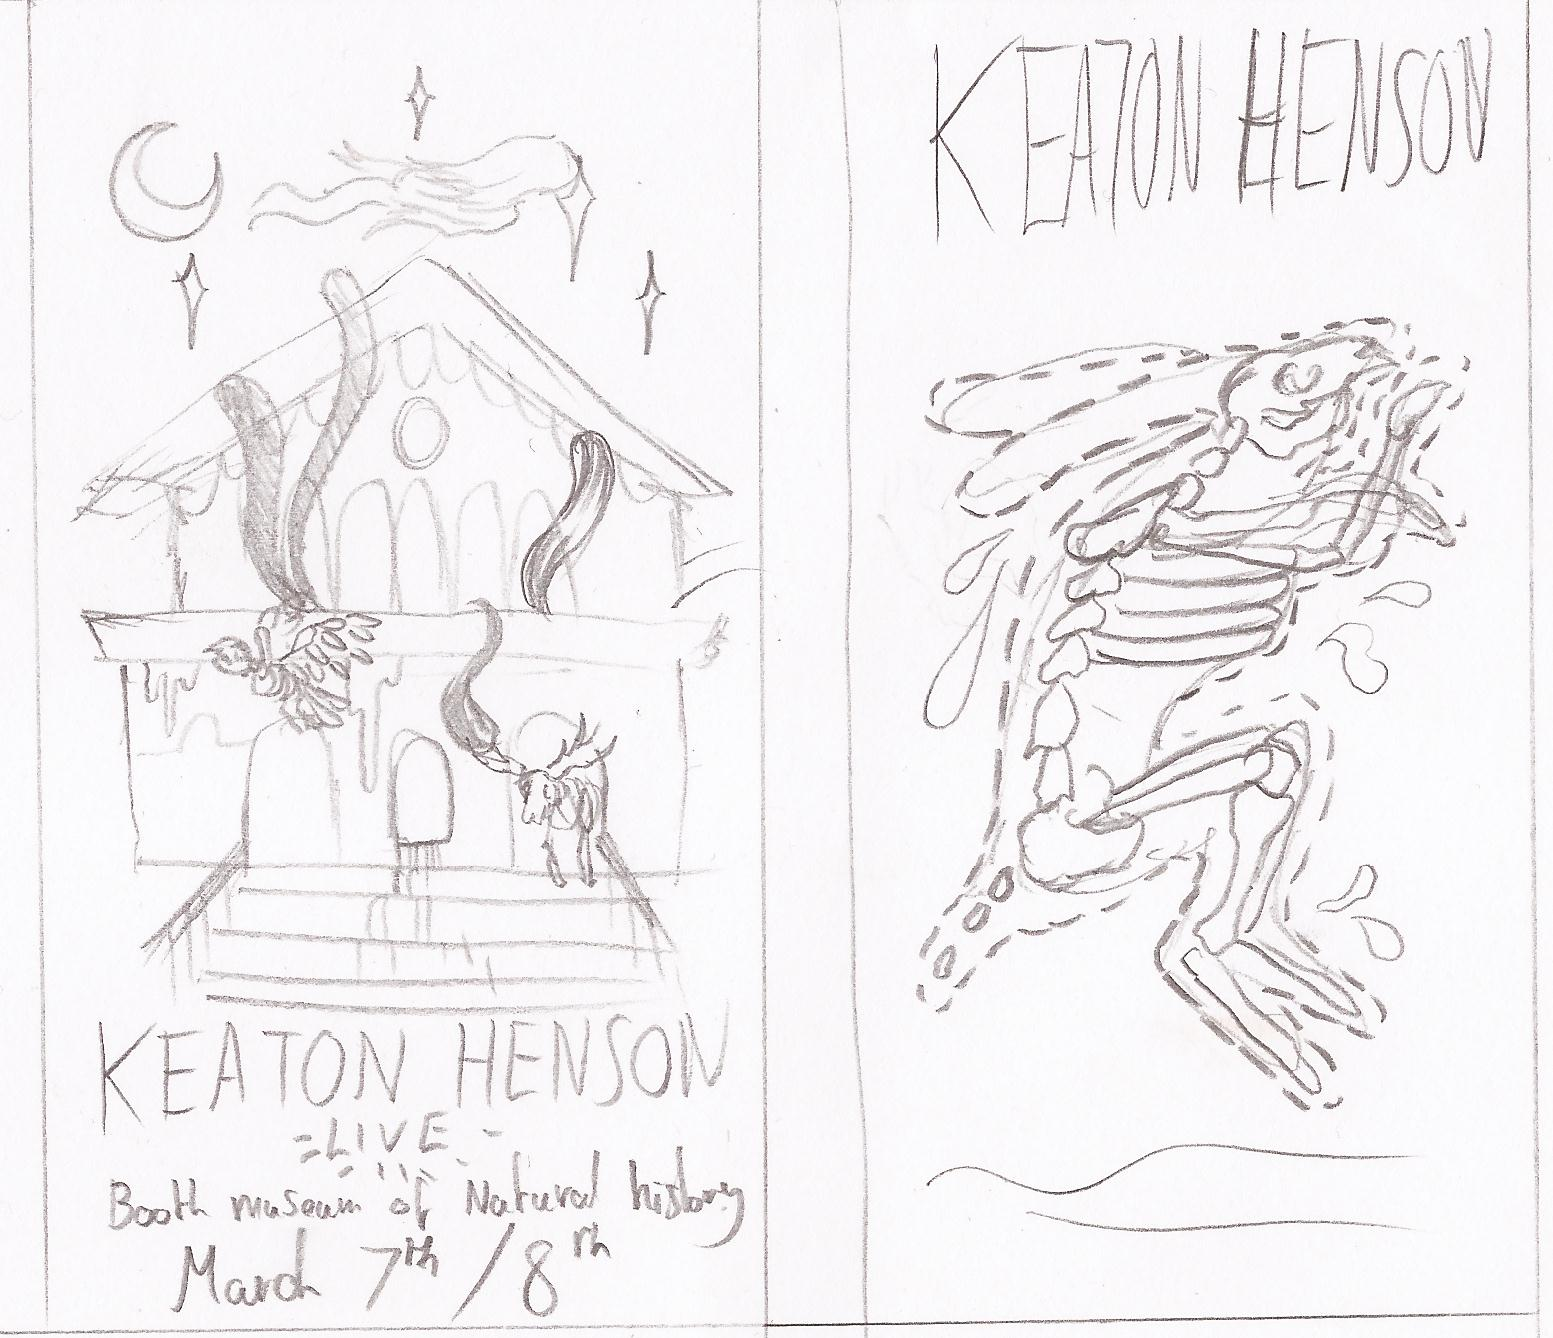 Keaton Henson - Museum Tour. - image 1 - student project